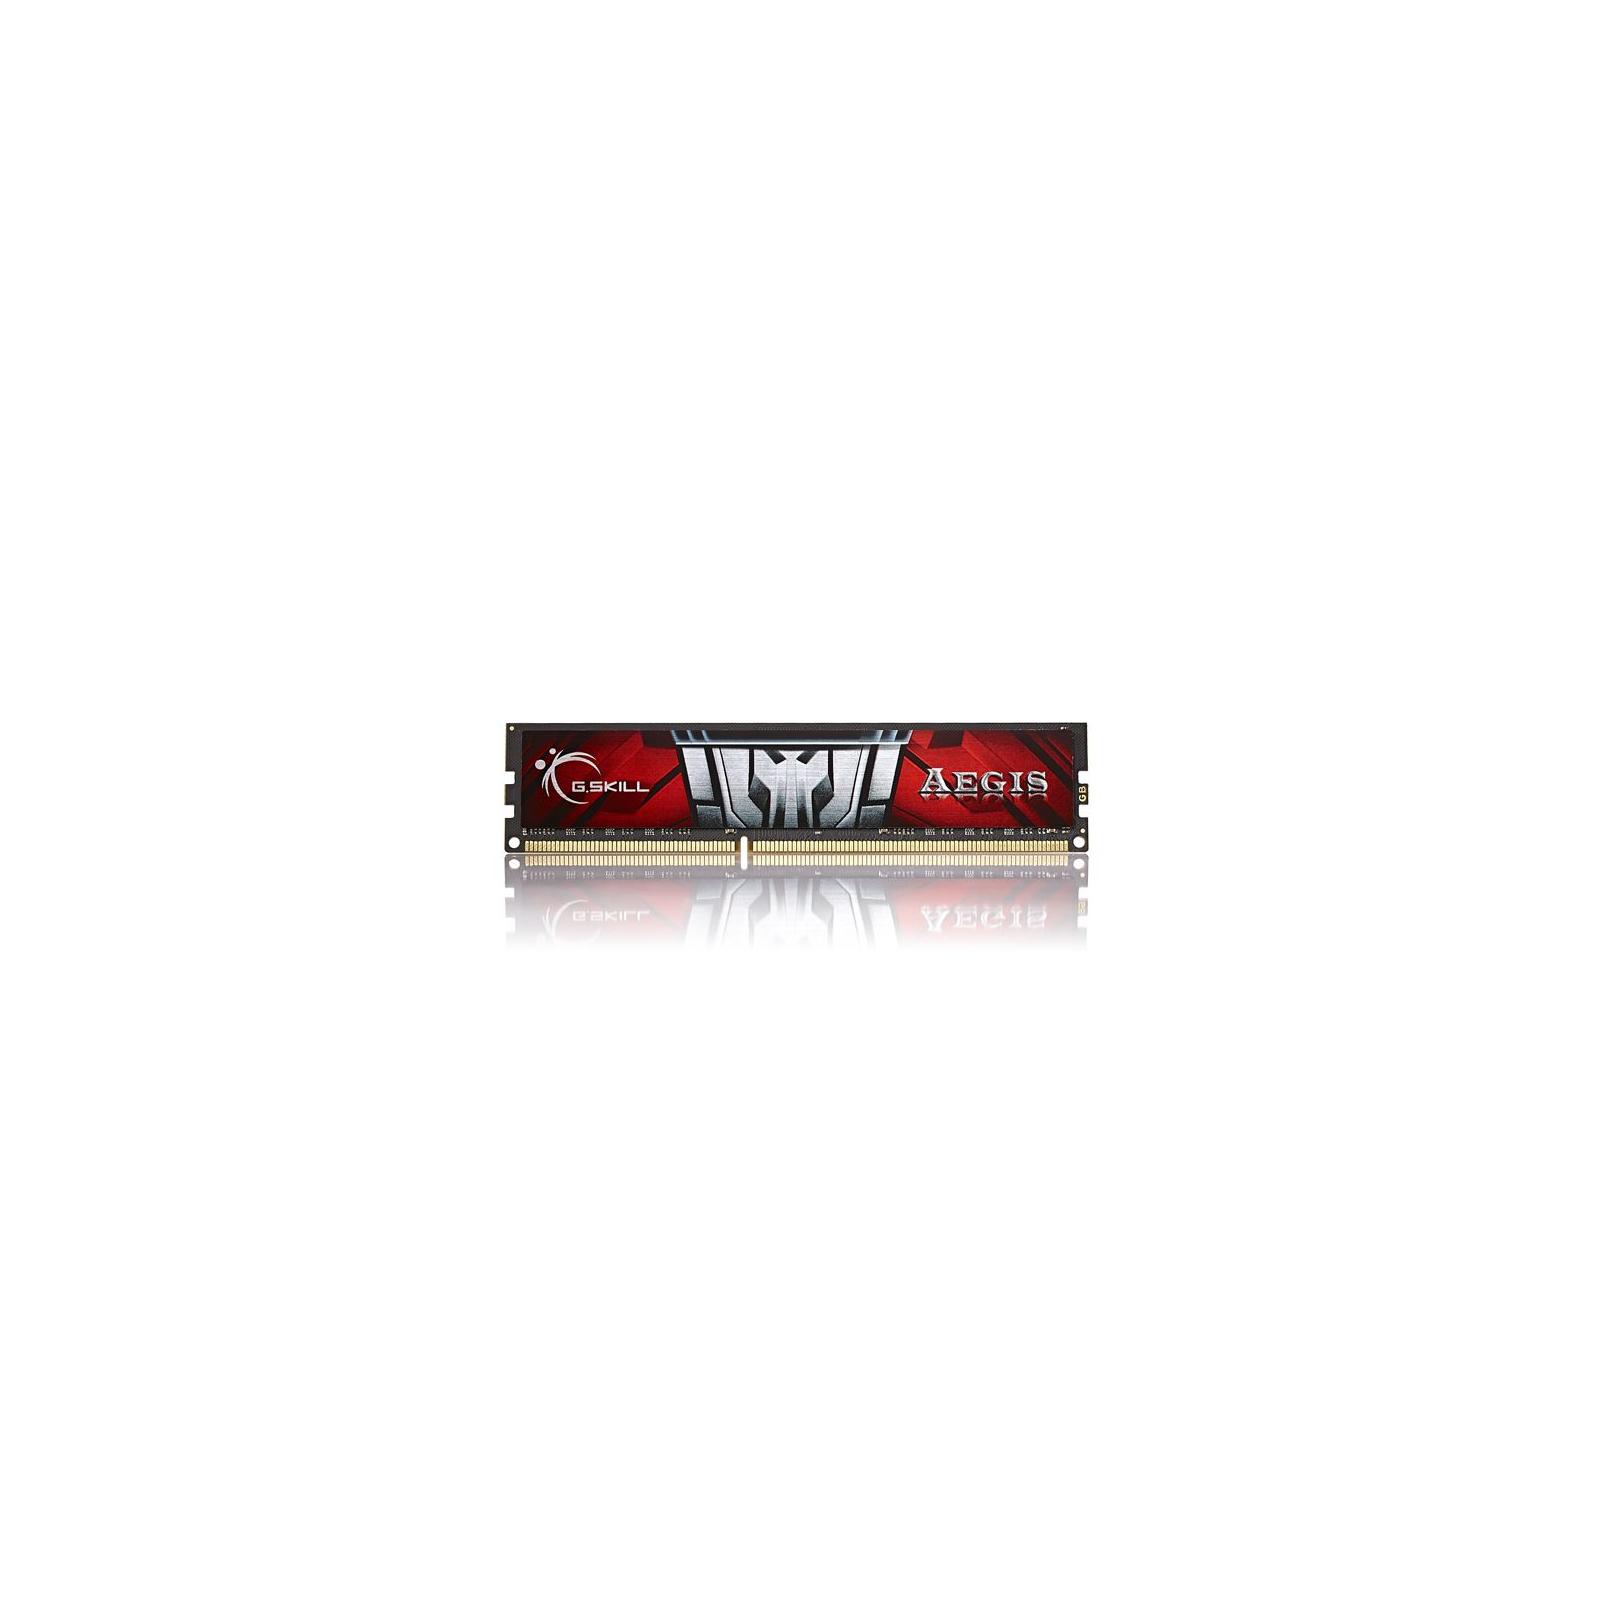 Модуль памяти для компьютера DDR3 4GB 1600 MHz G.Skill (F3-1600C11S-4GIS)